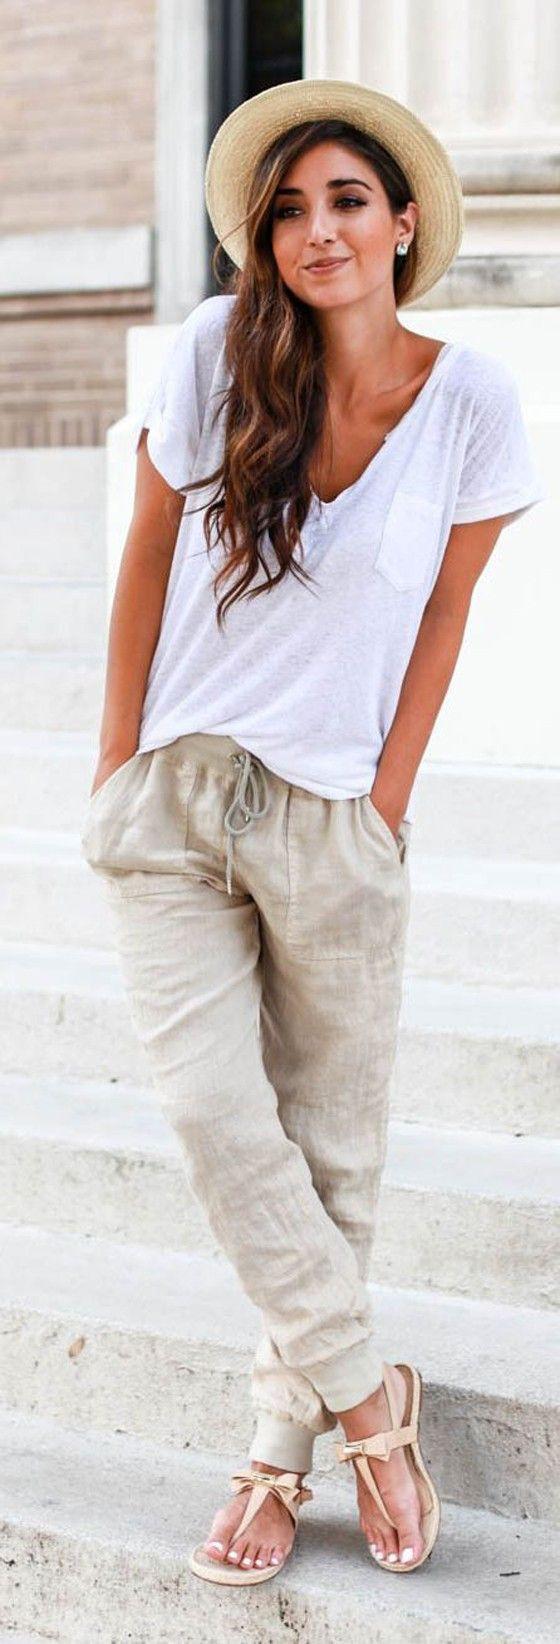 Casual simple beach outfit, street fashion, casual wear, t shirt